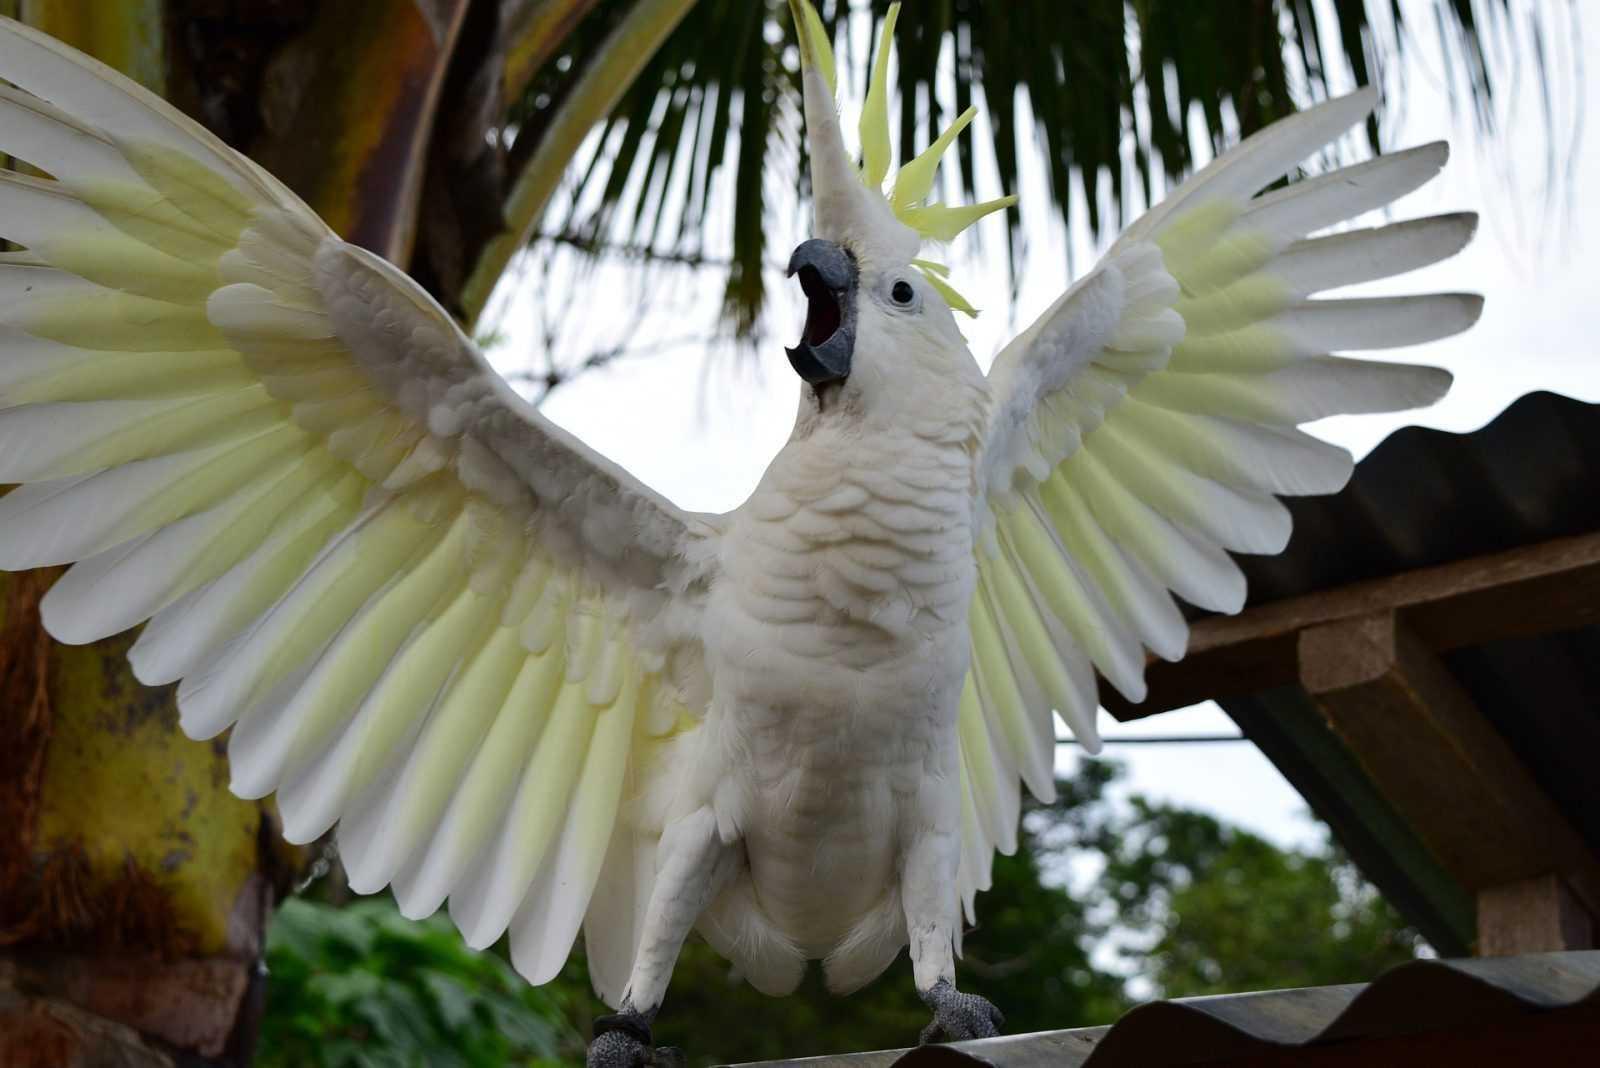 Pemelihara Burung Cenderawasih Dan Kakatua Ditangkap Polisi